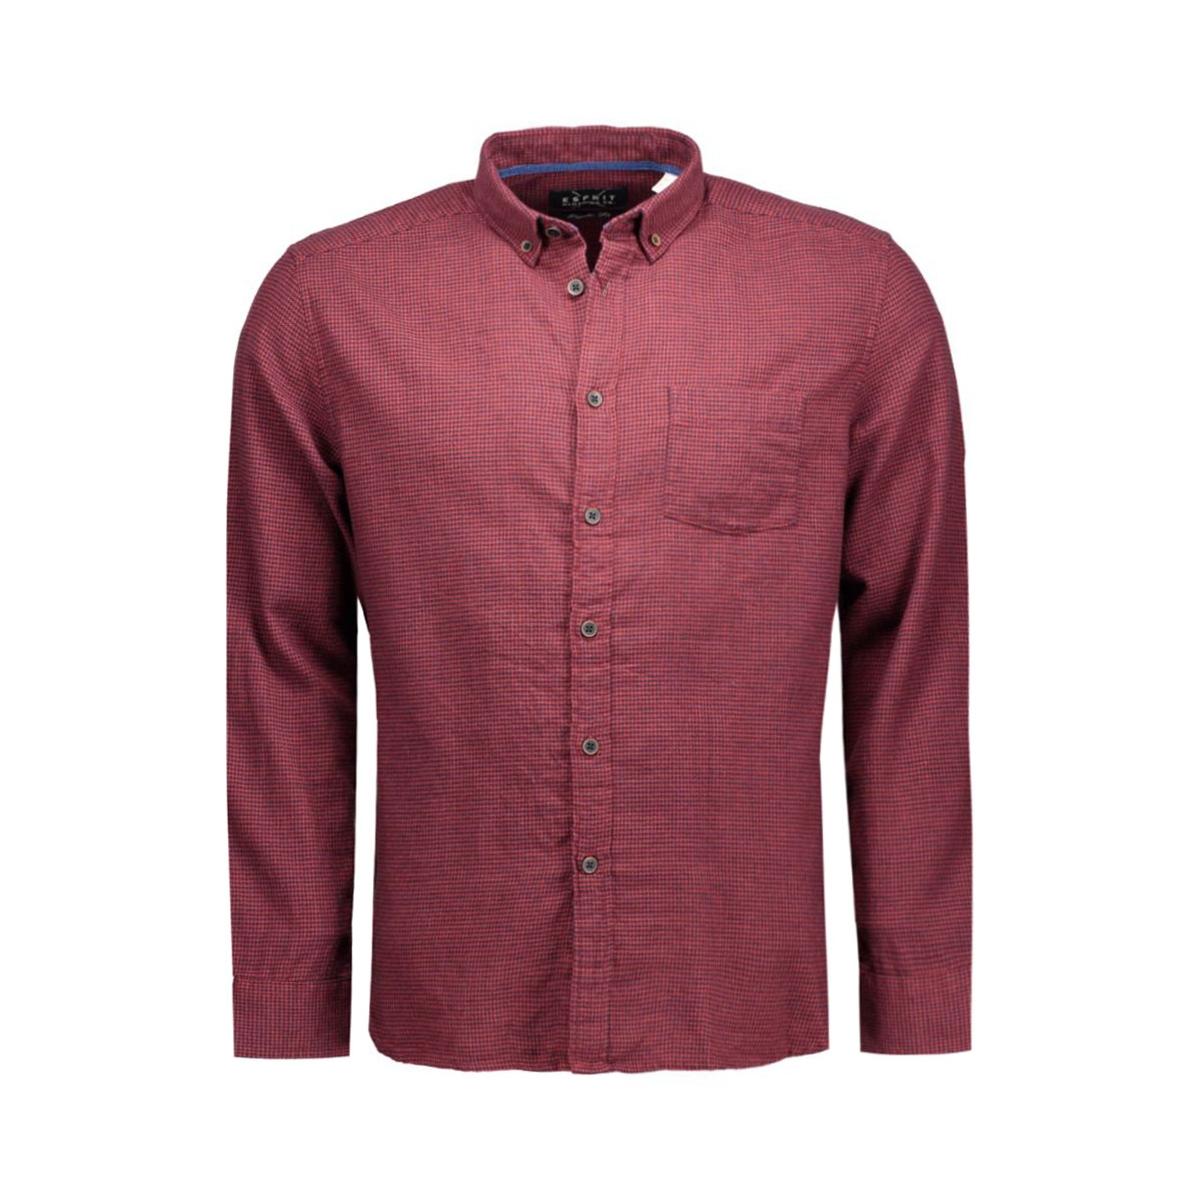 096ee2f005 esprit overhemd e805